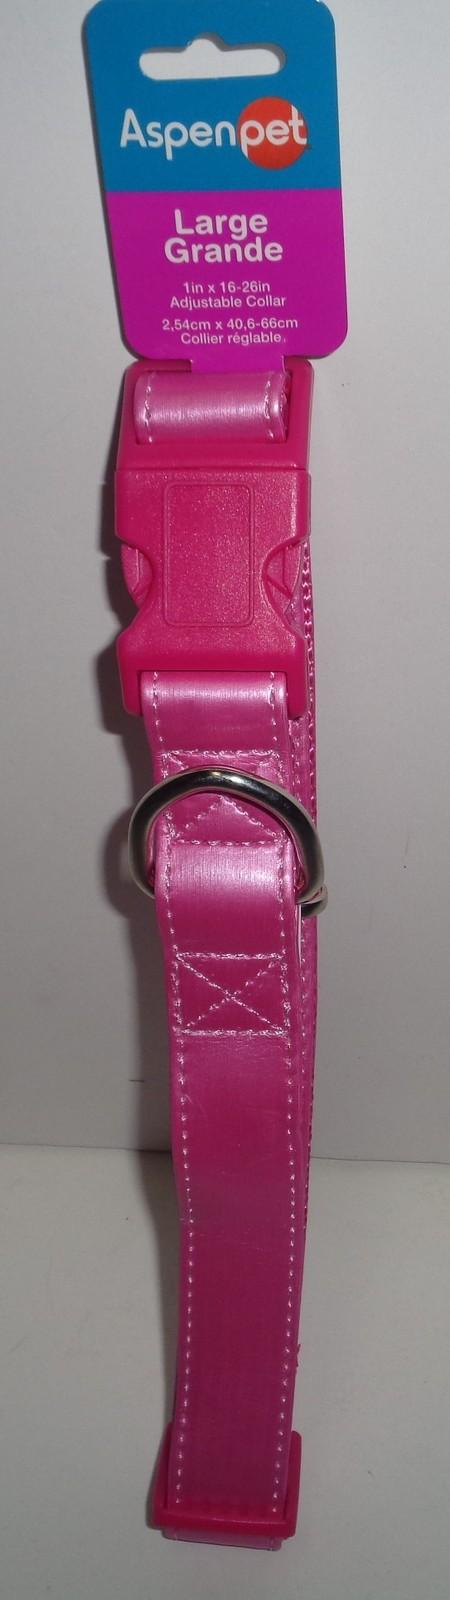 Neon Hot Pink Large Dog Collar NWT Aspen Pet Adjustable